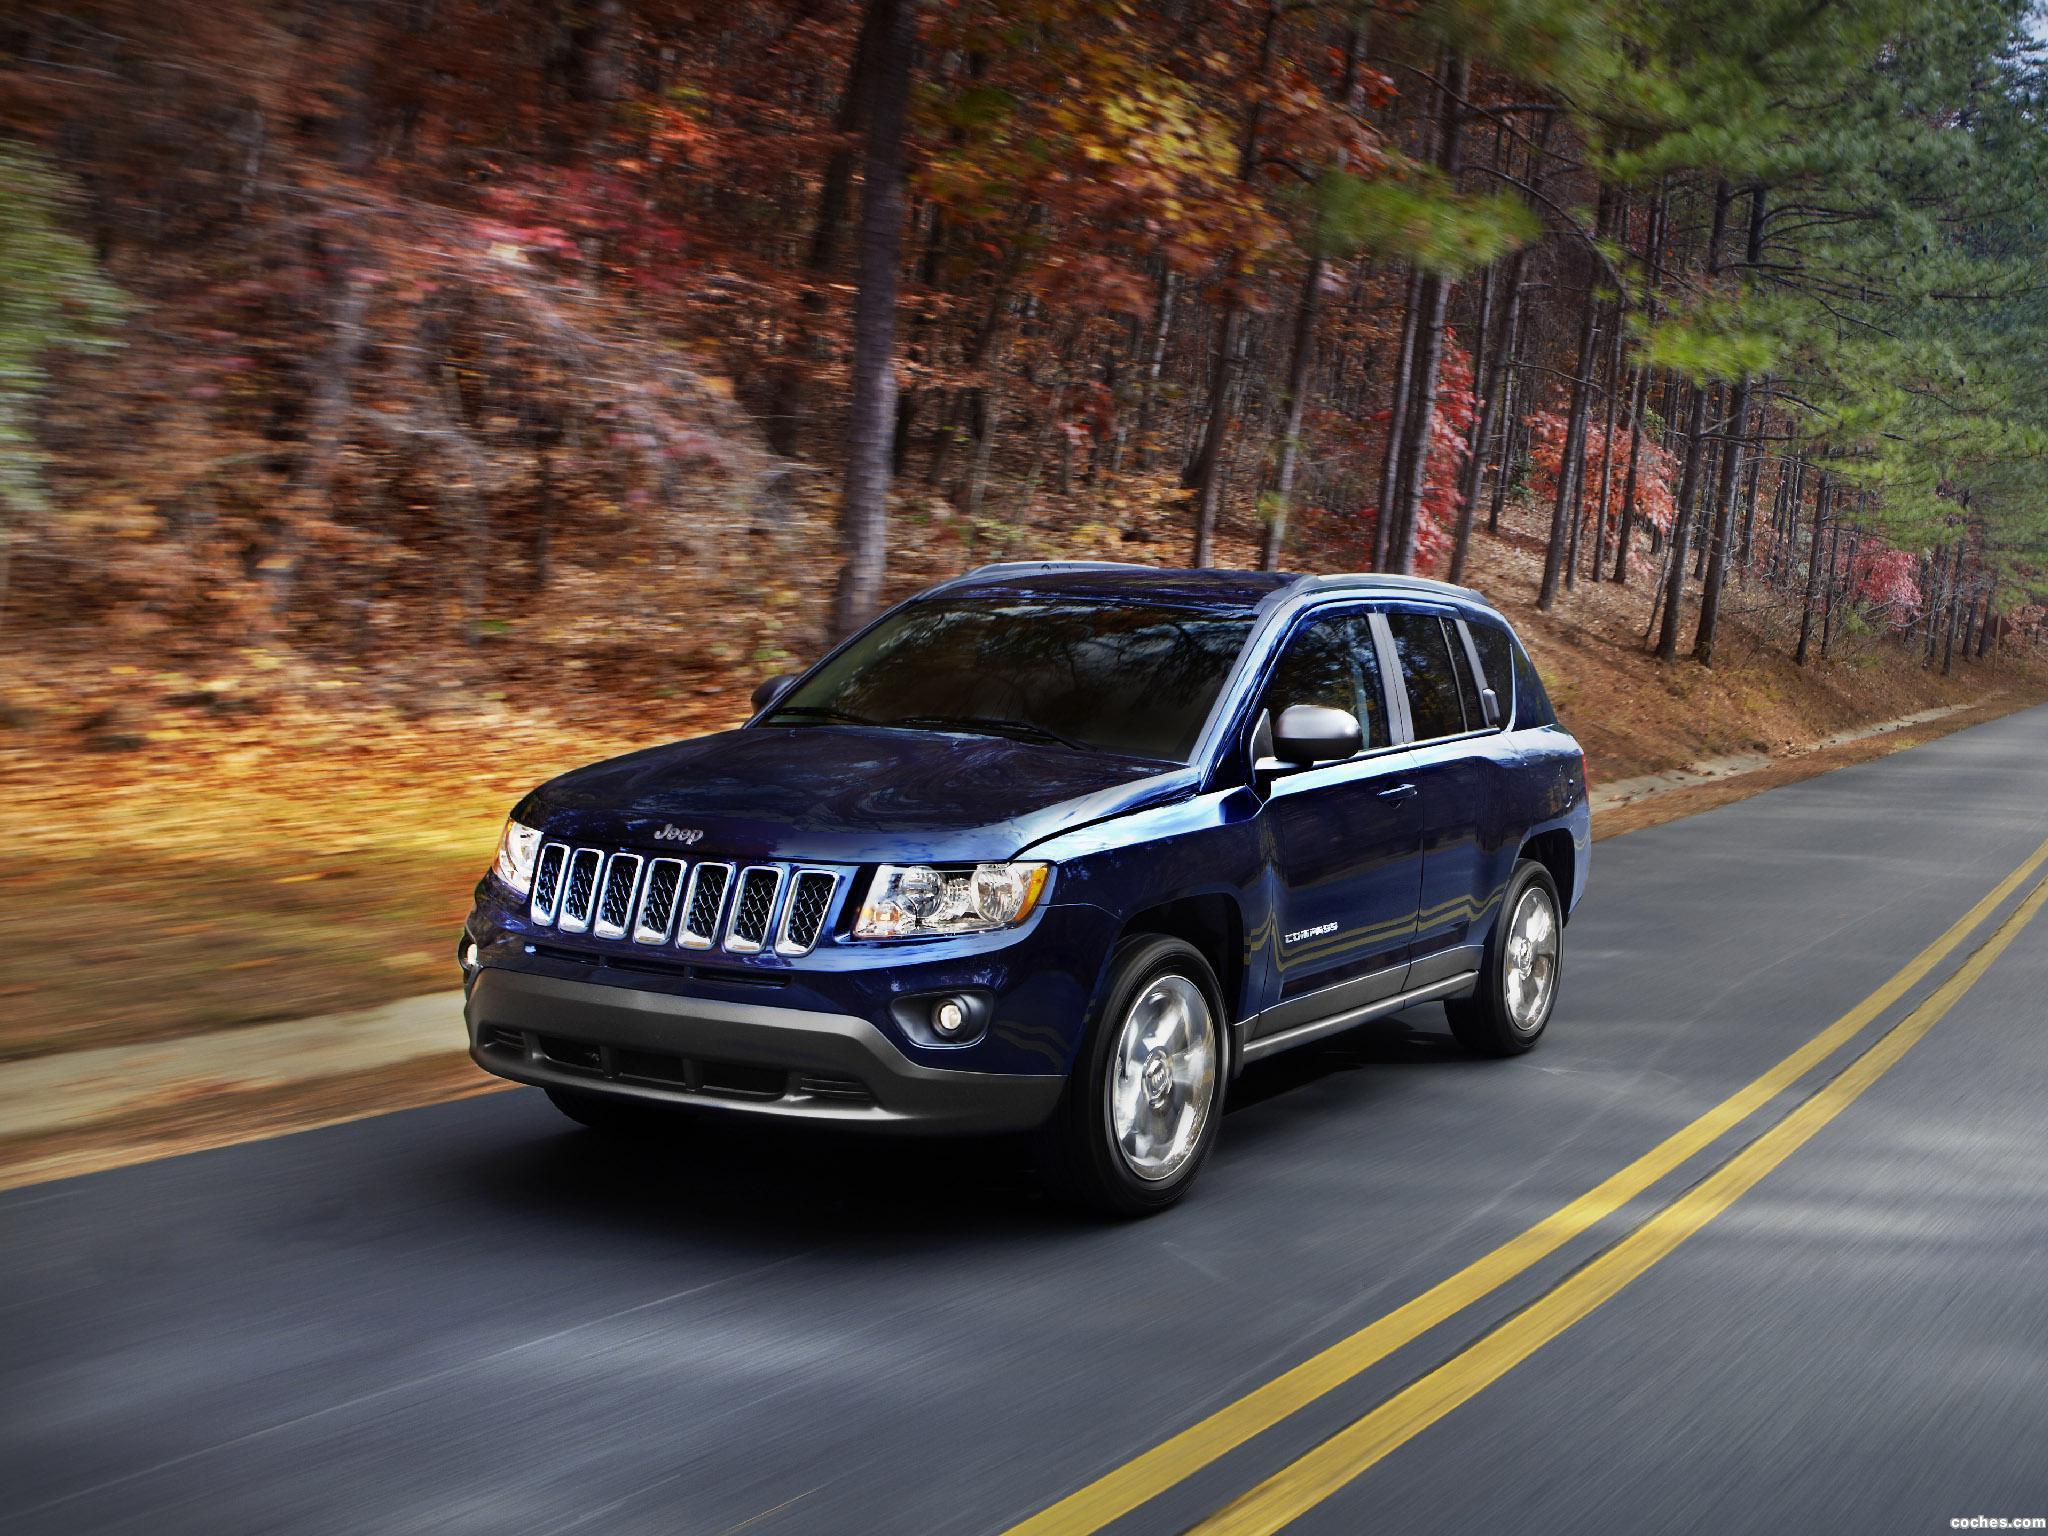 Foto 3 de Jeep Compass 2011